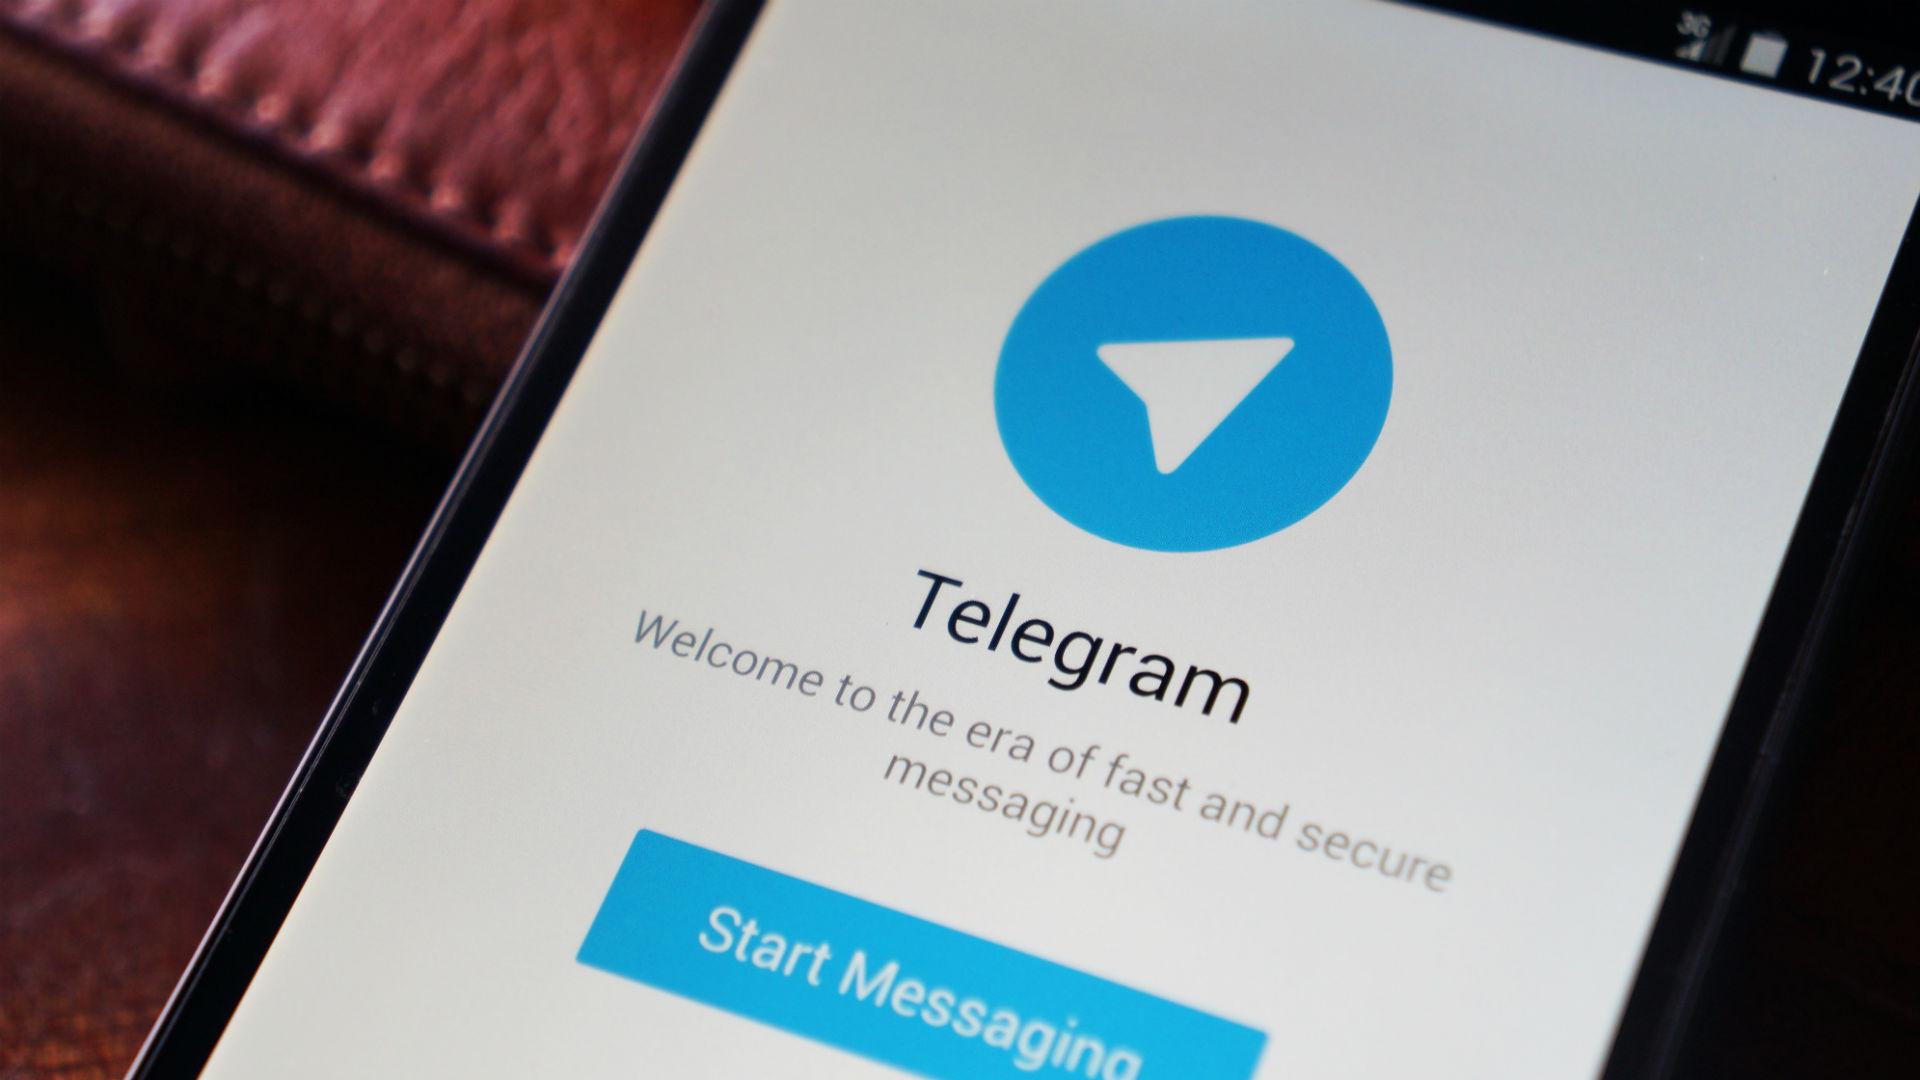 Ya puedes subir a Telegram tu pasaporte y DNI para identificarte online